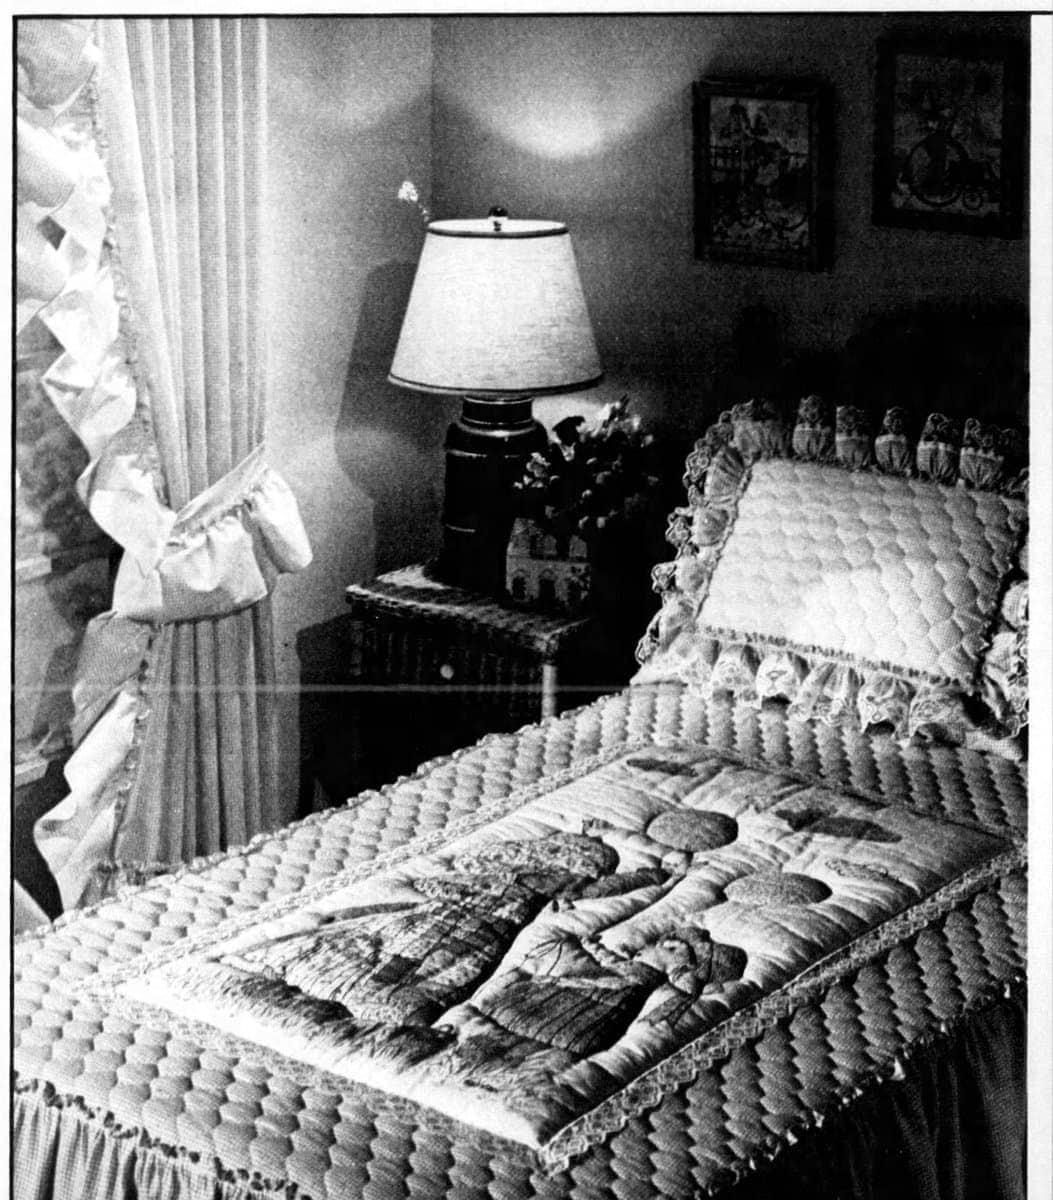 Holly Hobbie bedding (1981)